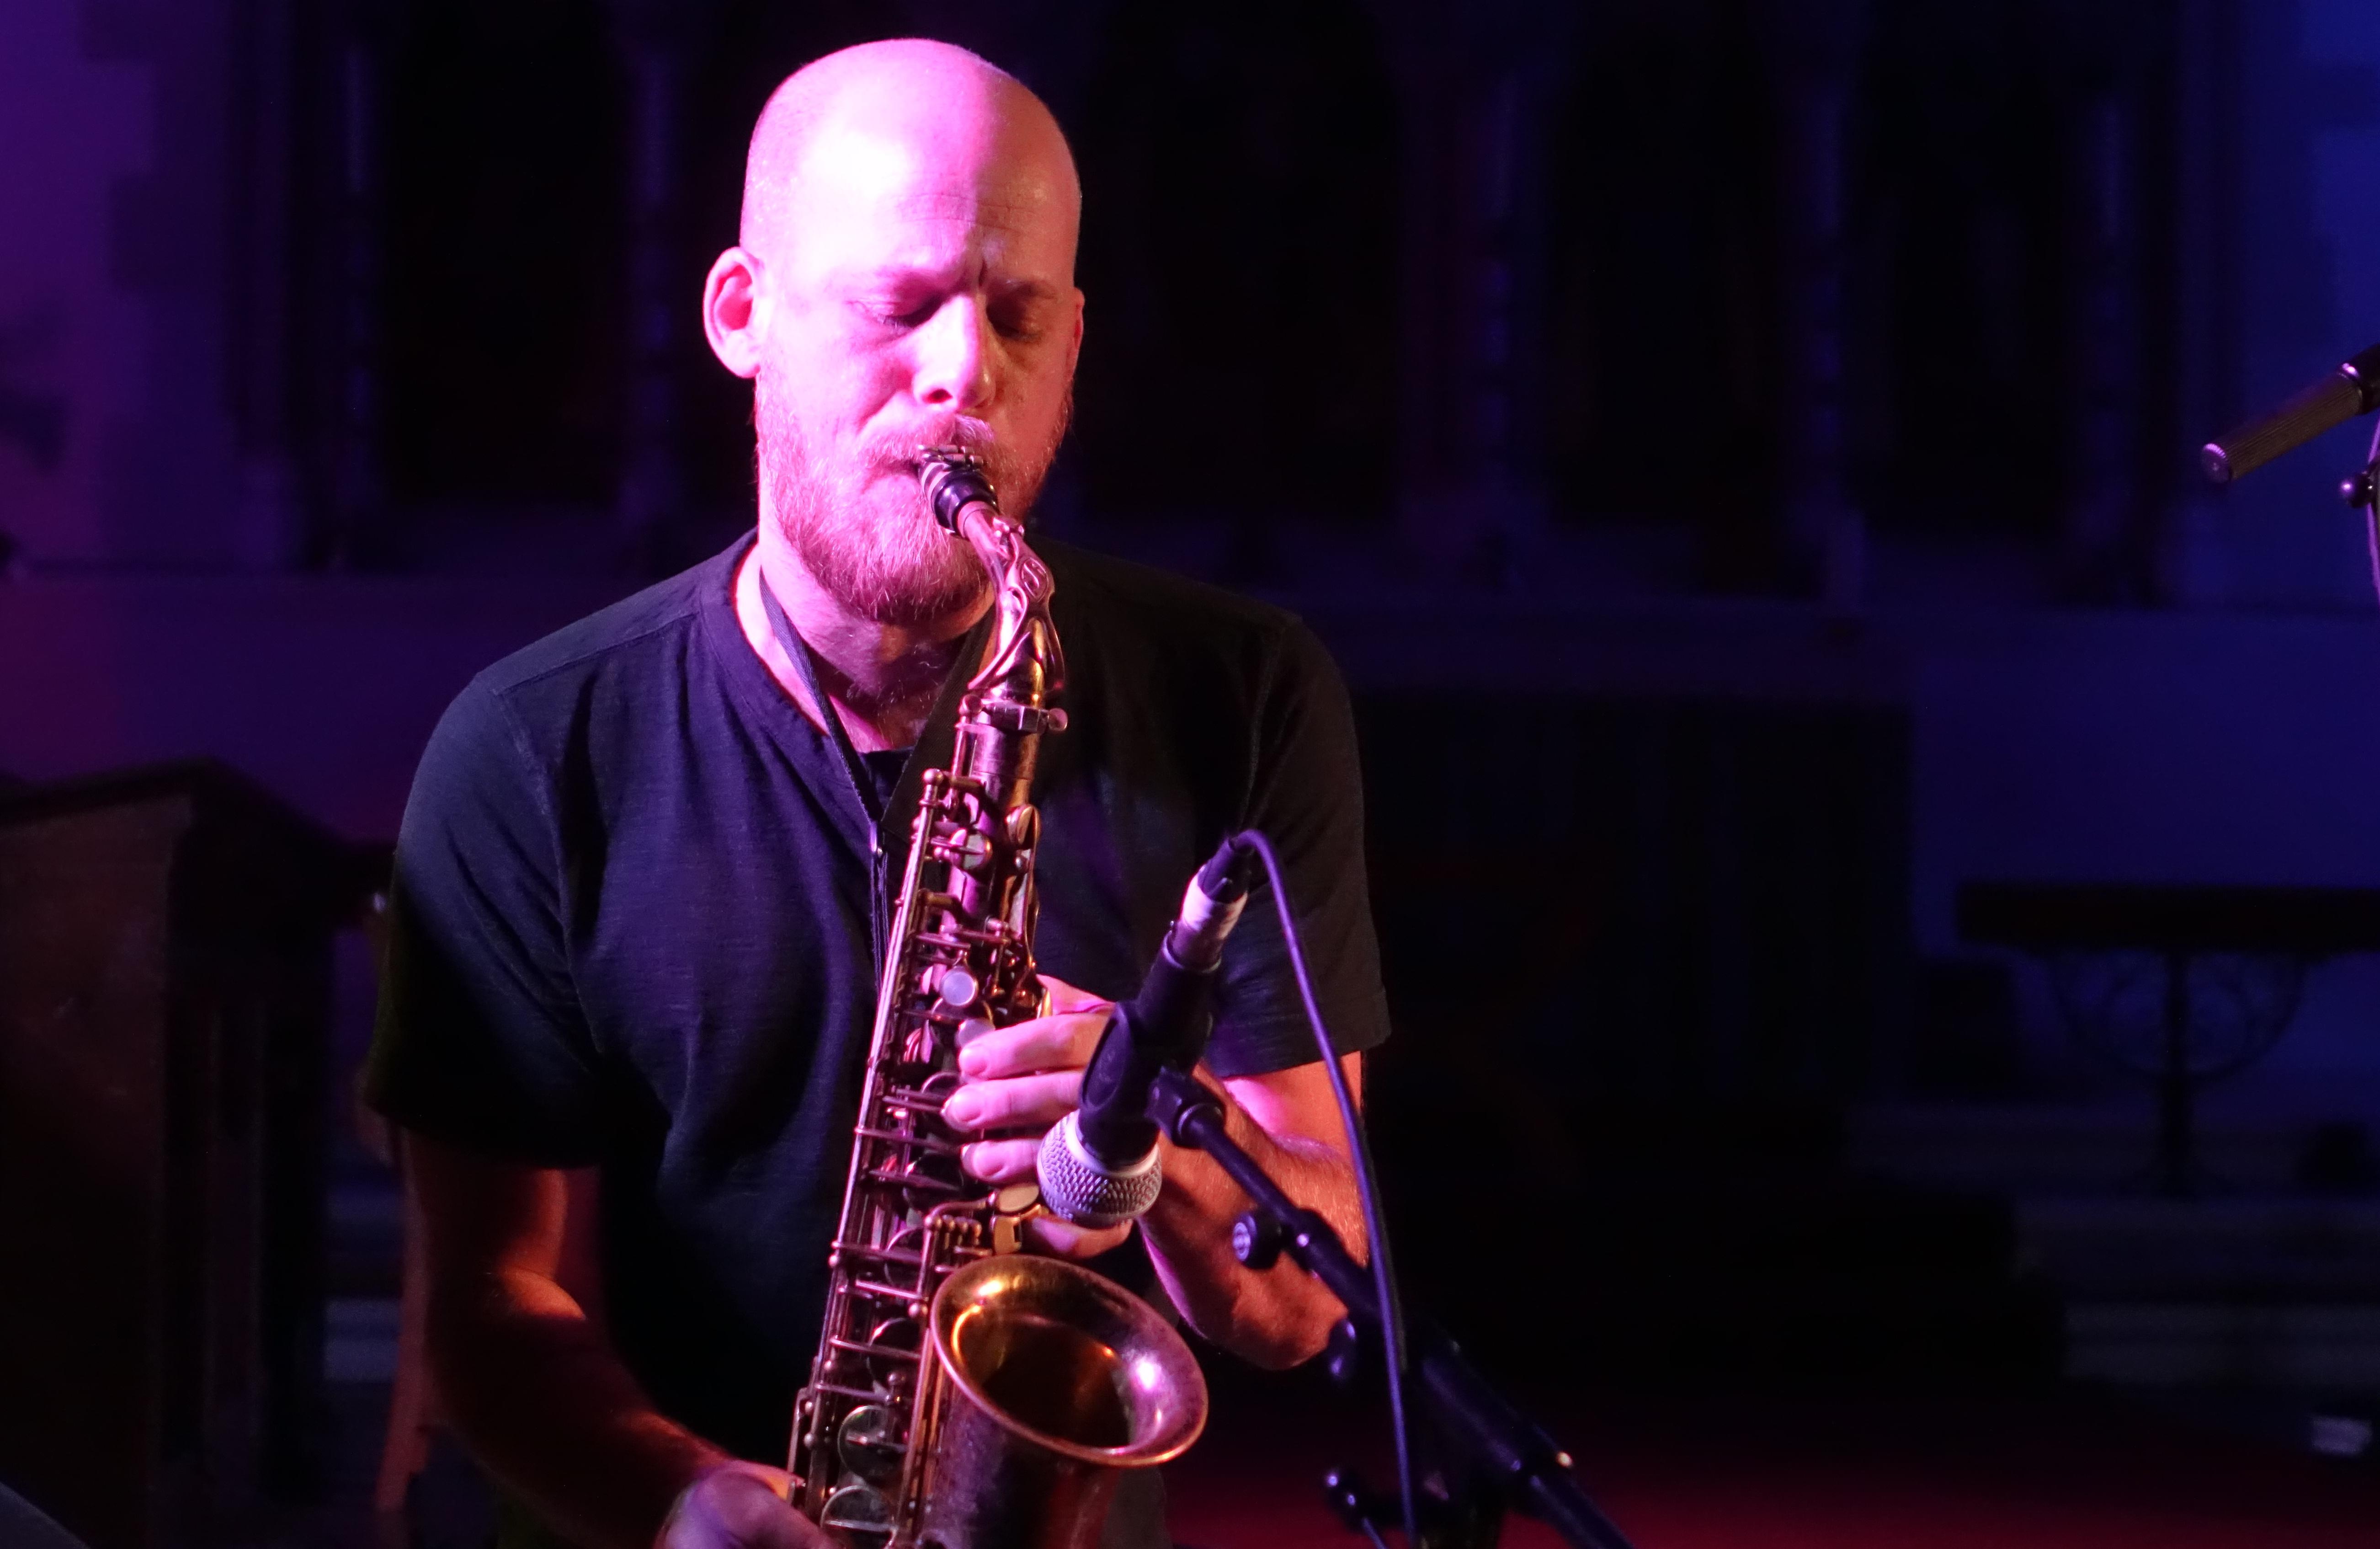 Keir Neuringer at Brighton Alternative Jazz Festival in October 2018